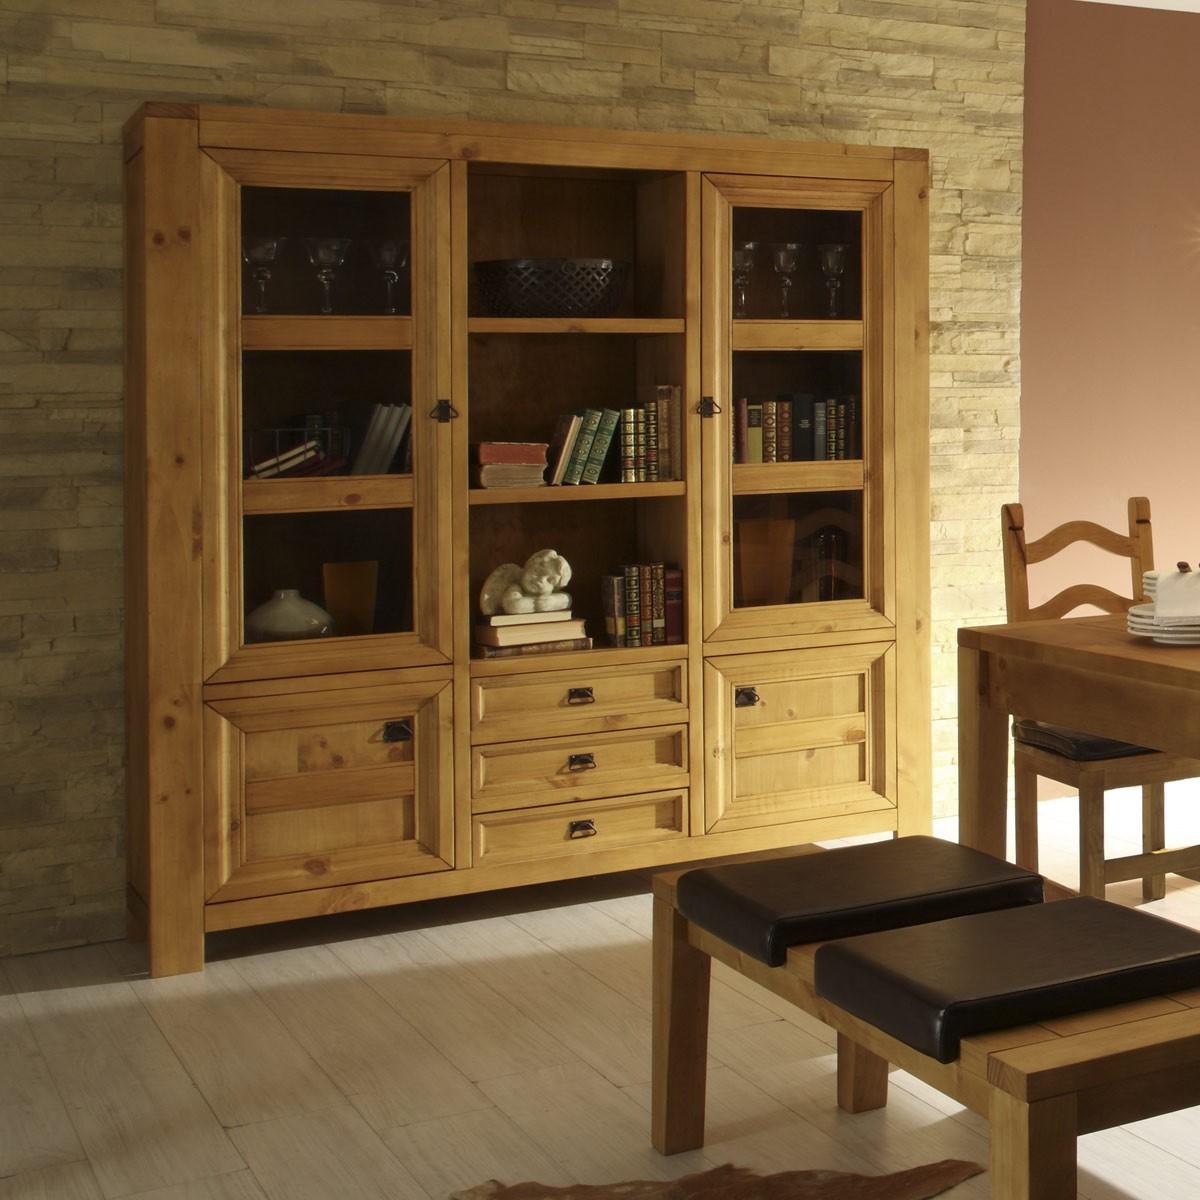 erfreut buffetschrank eiche ideen die besten. Black Bedroom Furniture Sets. Home Design Ideas